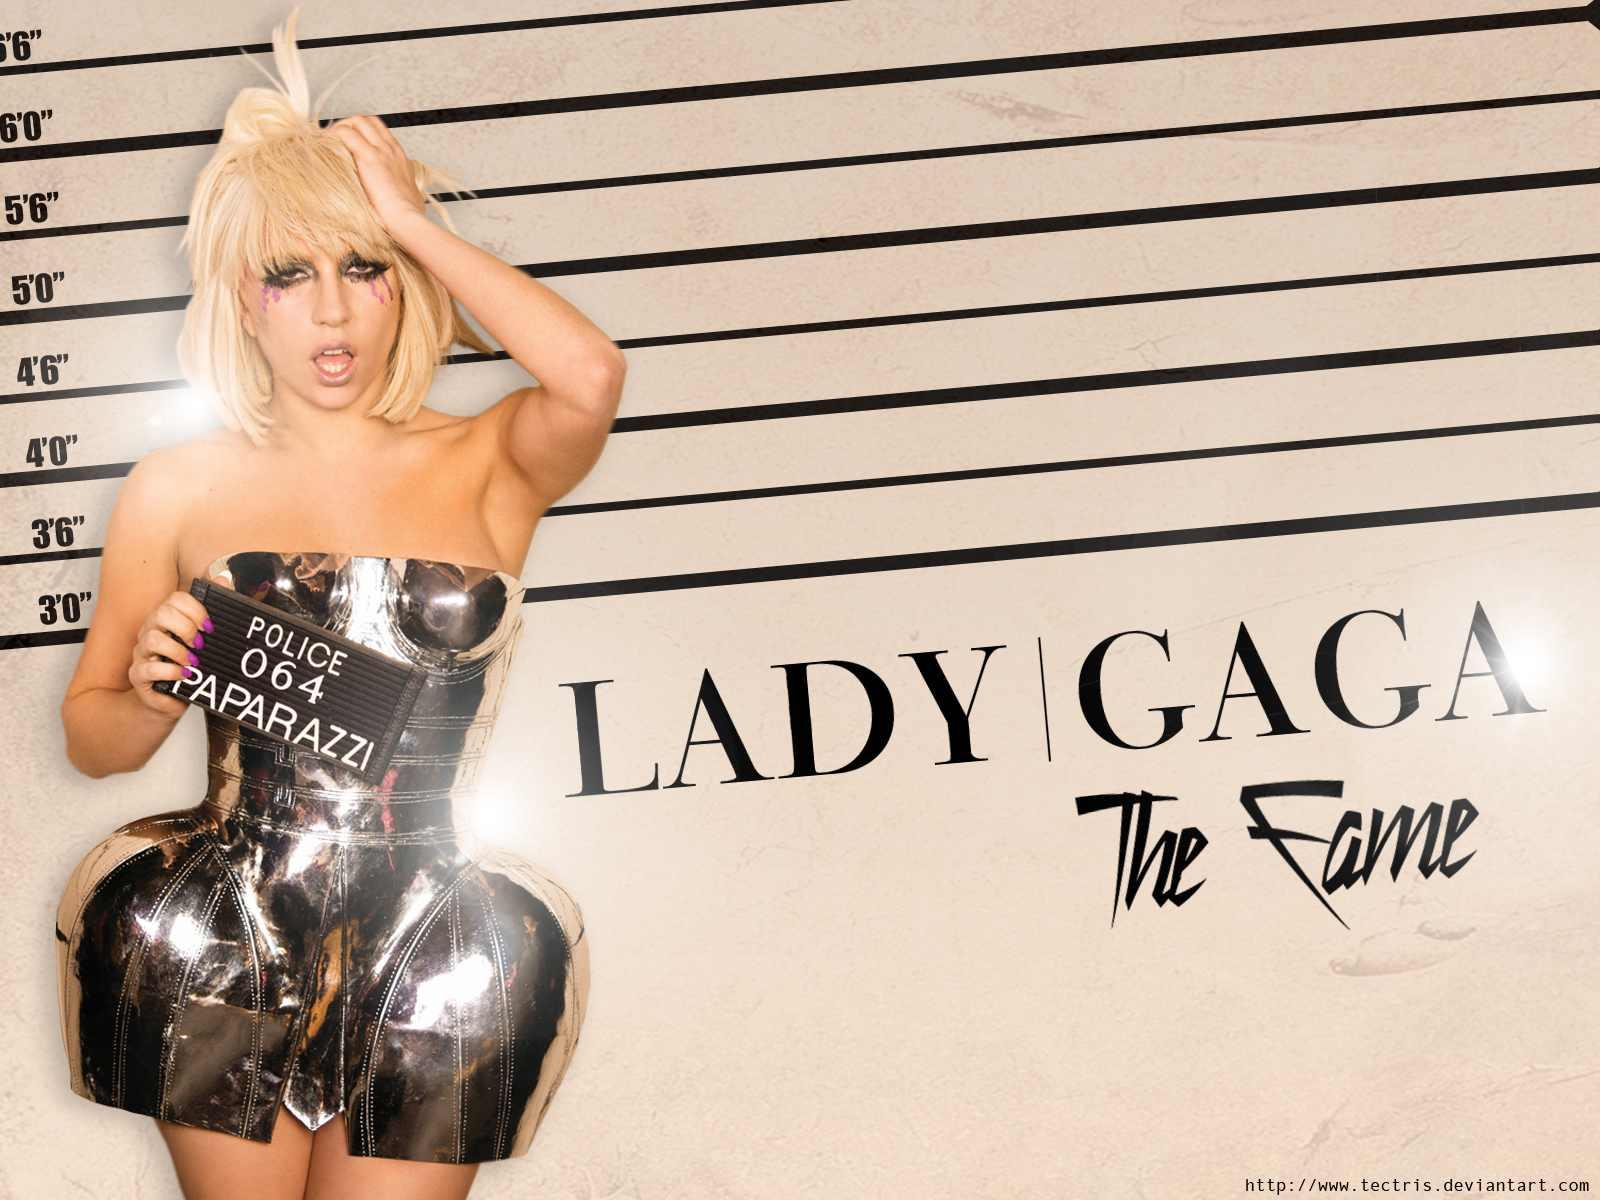 http://1.bp.blogspot.com/-MYhtW2_Pf8I/TeQbsVG9RSI/AAAAAAAAAHE/ussfNVgeXVQ/s1600/Lady_Gaga_Wallpaper_the_fame_mugshots_by_tectris.jpg